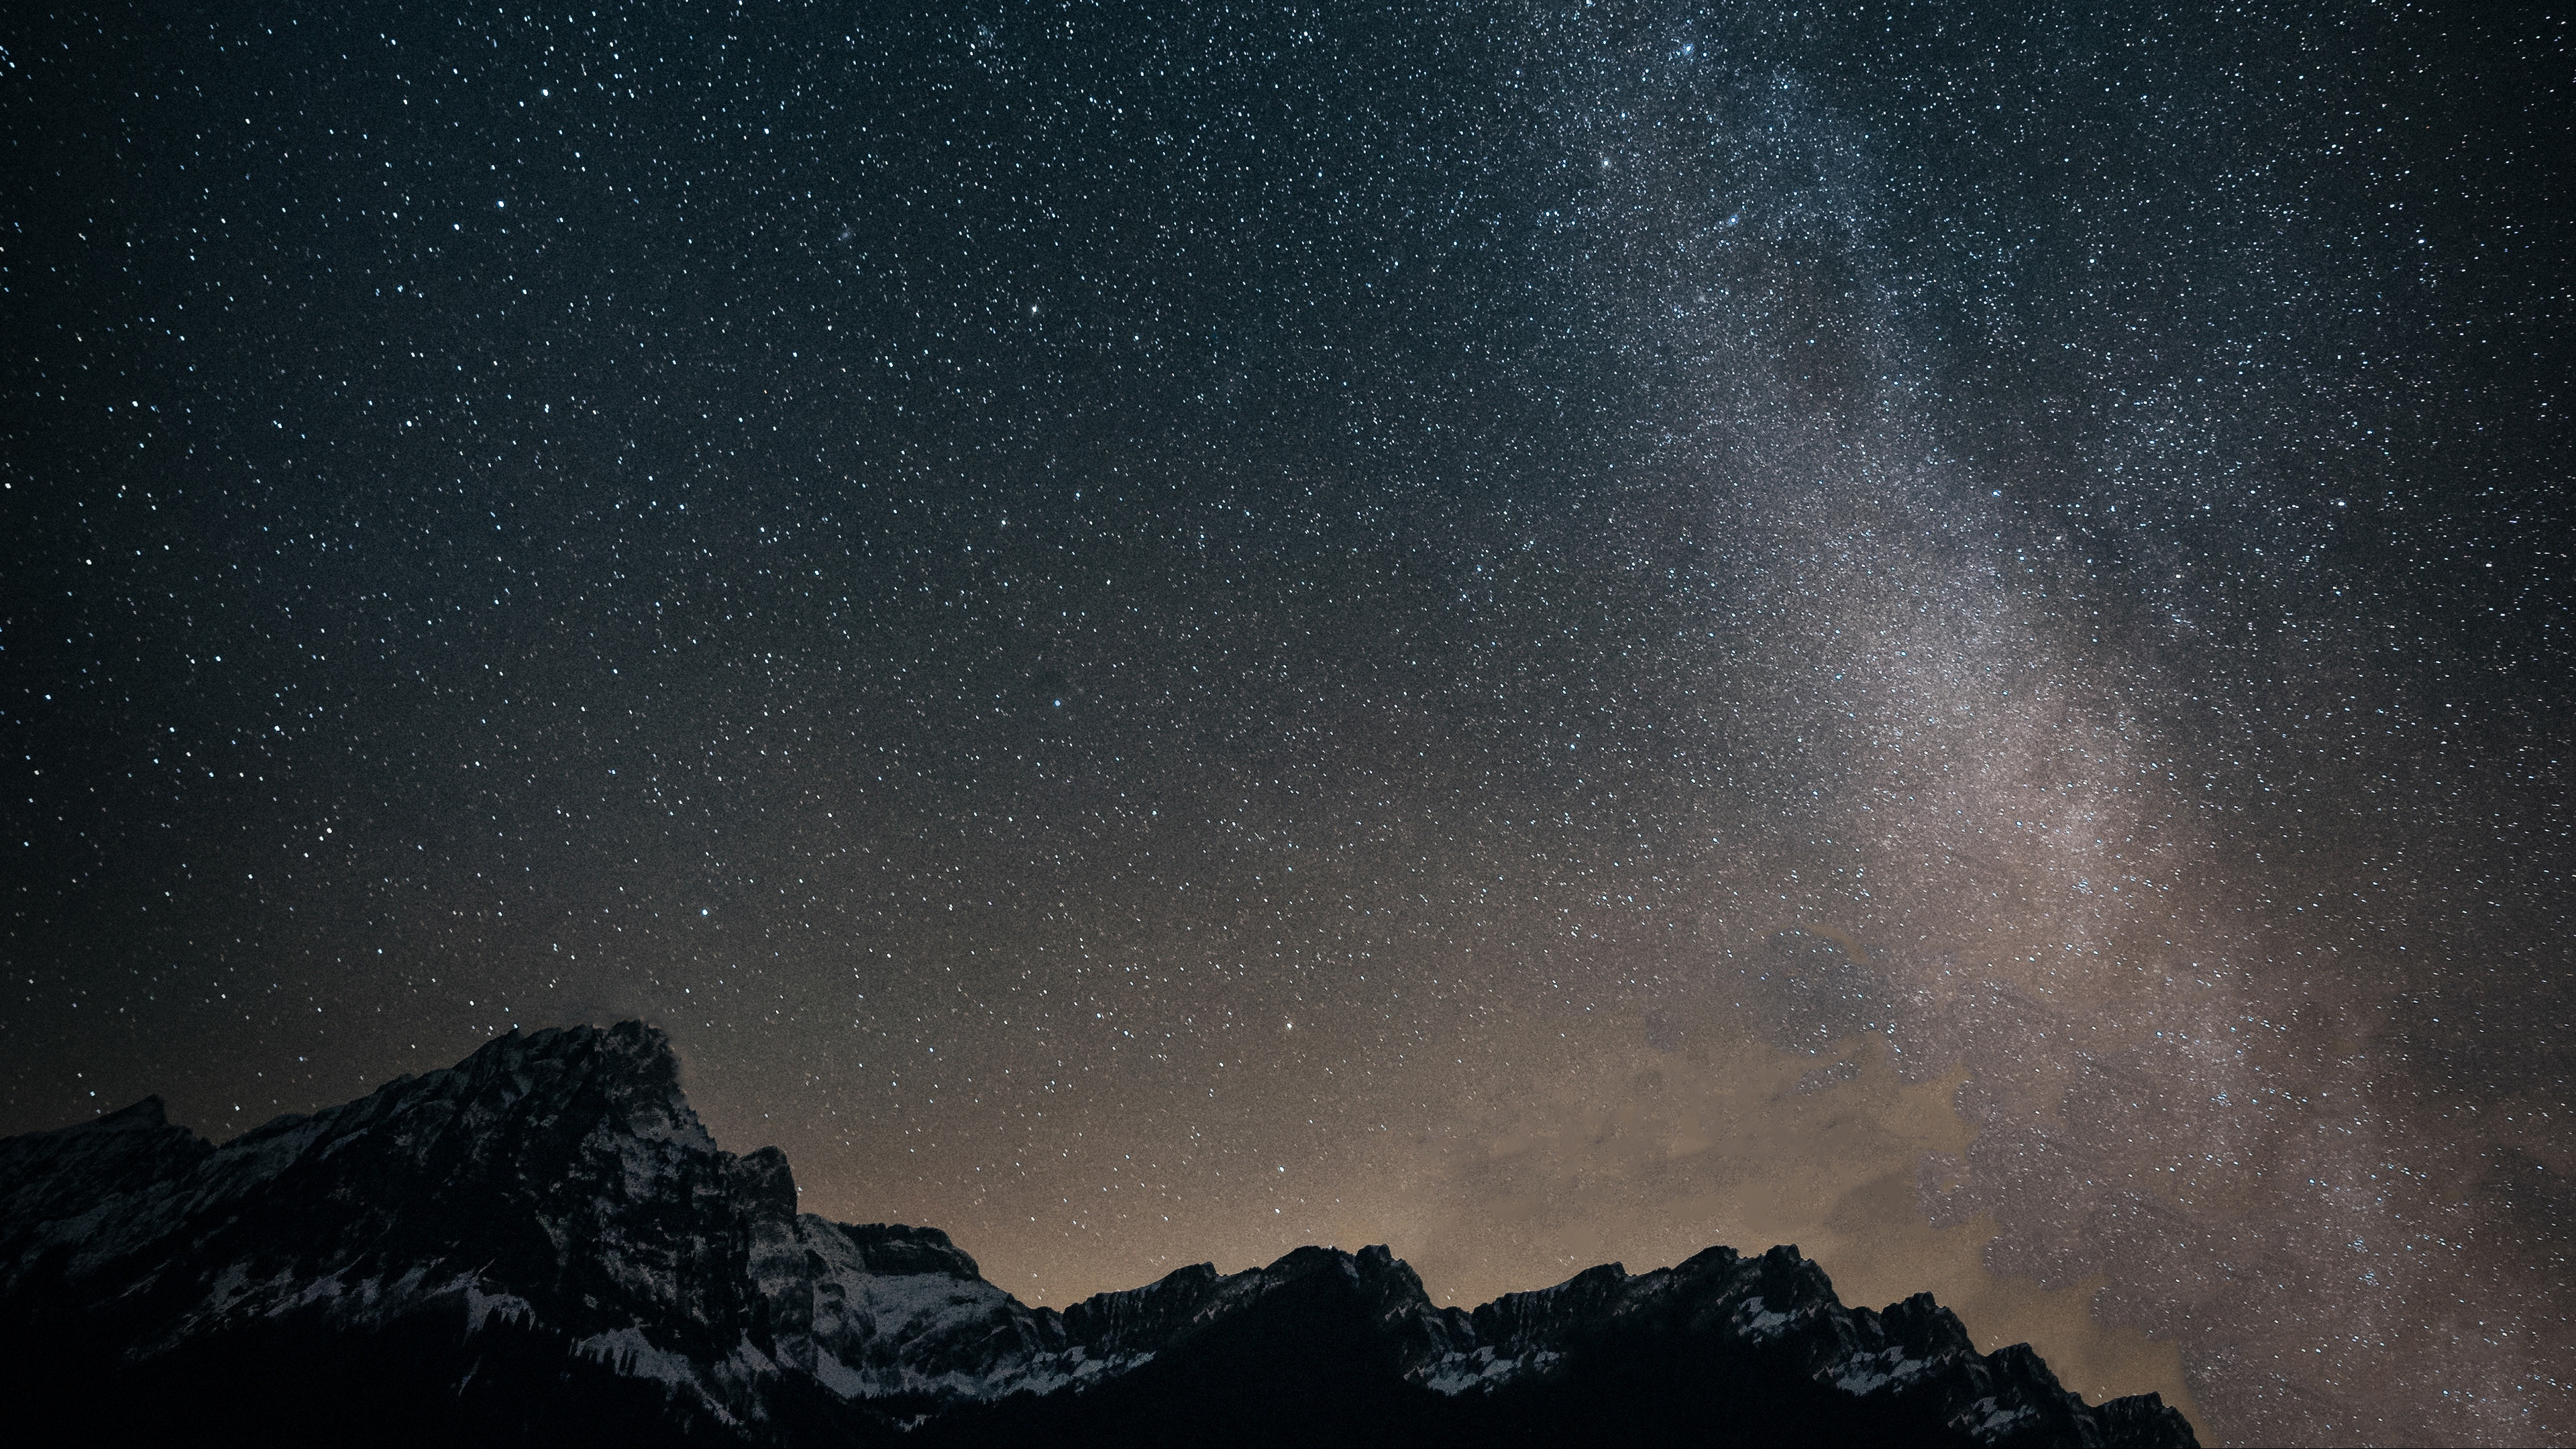 starry sky mountains milky way 4k 1536016907 - starry sky, mountains, milky way 4k - starry sky, Mountains, milky way